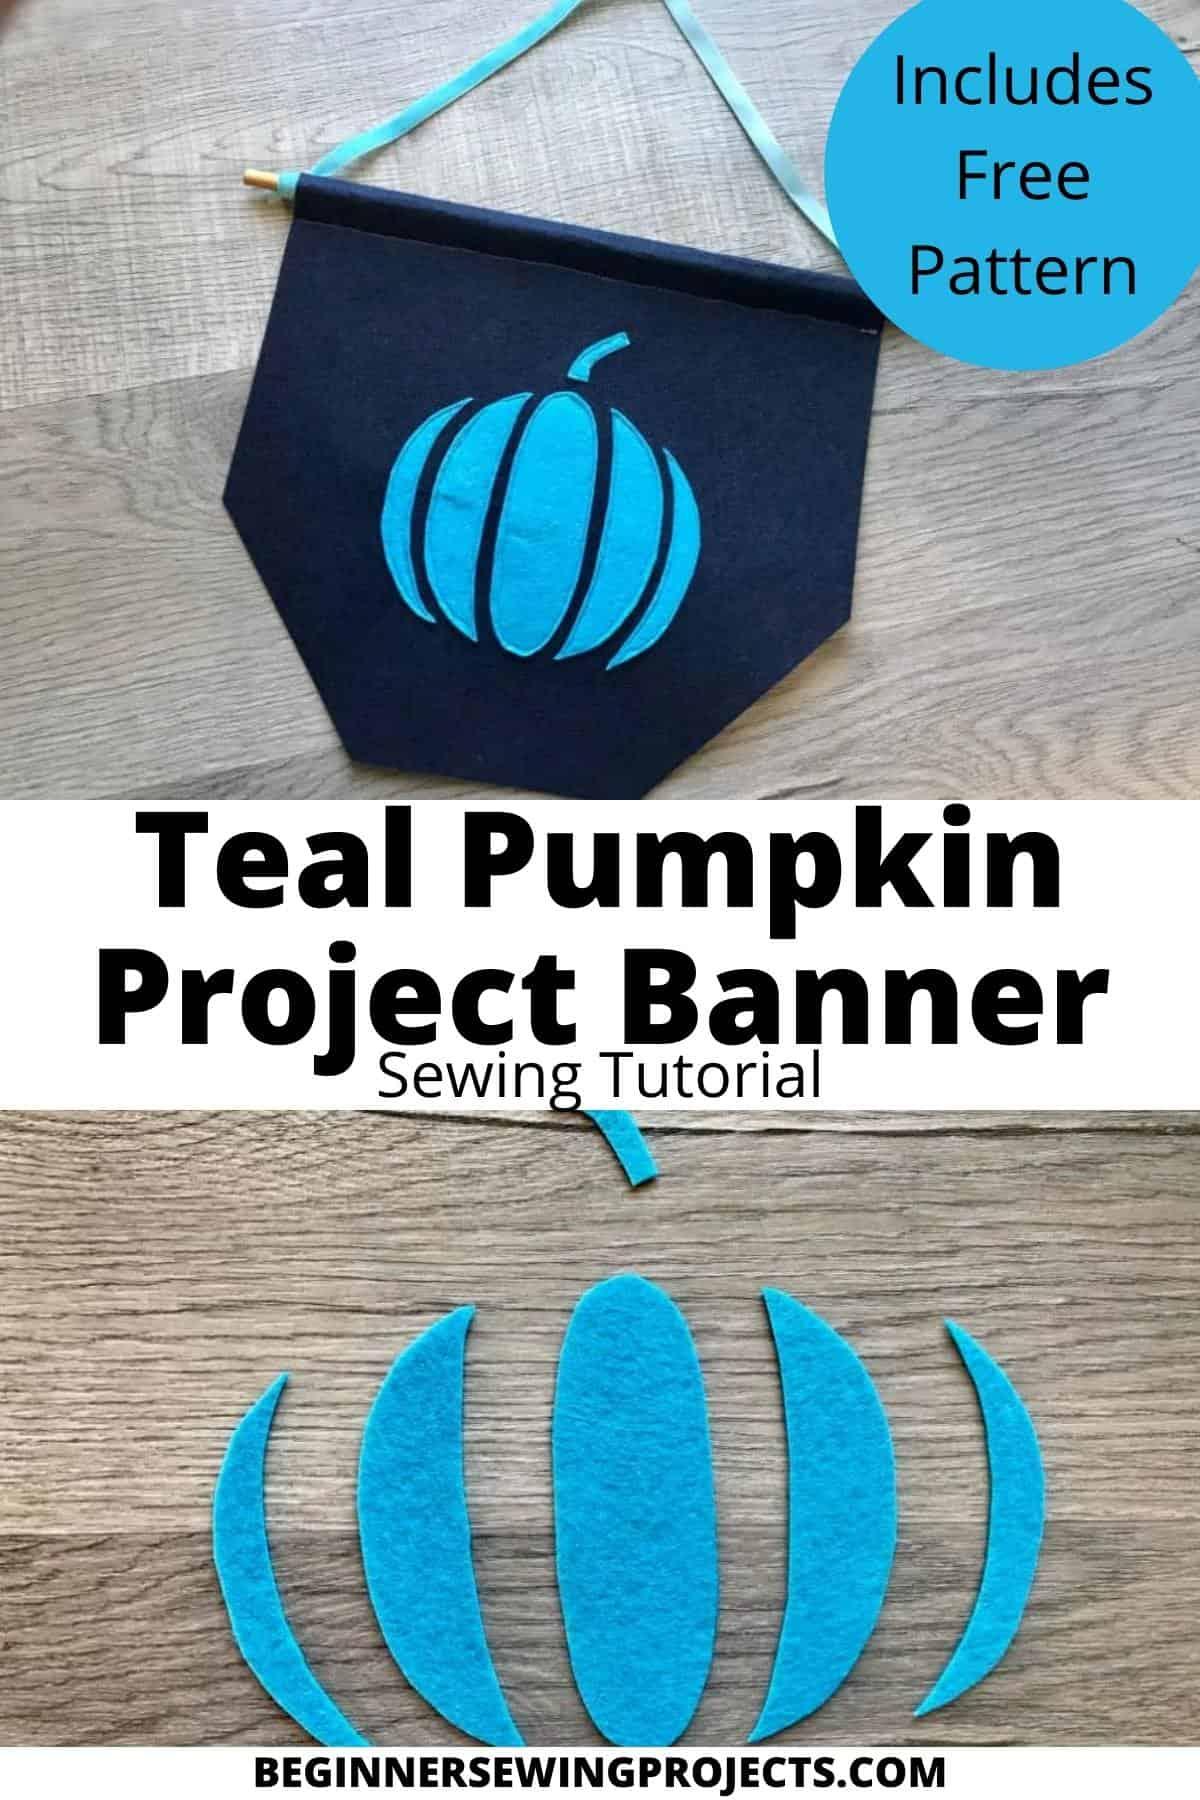 Teal Pumpkin Banner Project Sewing Tutorial